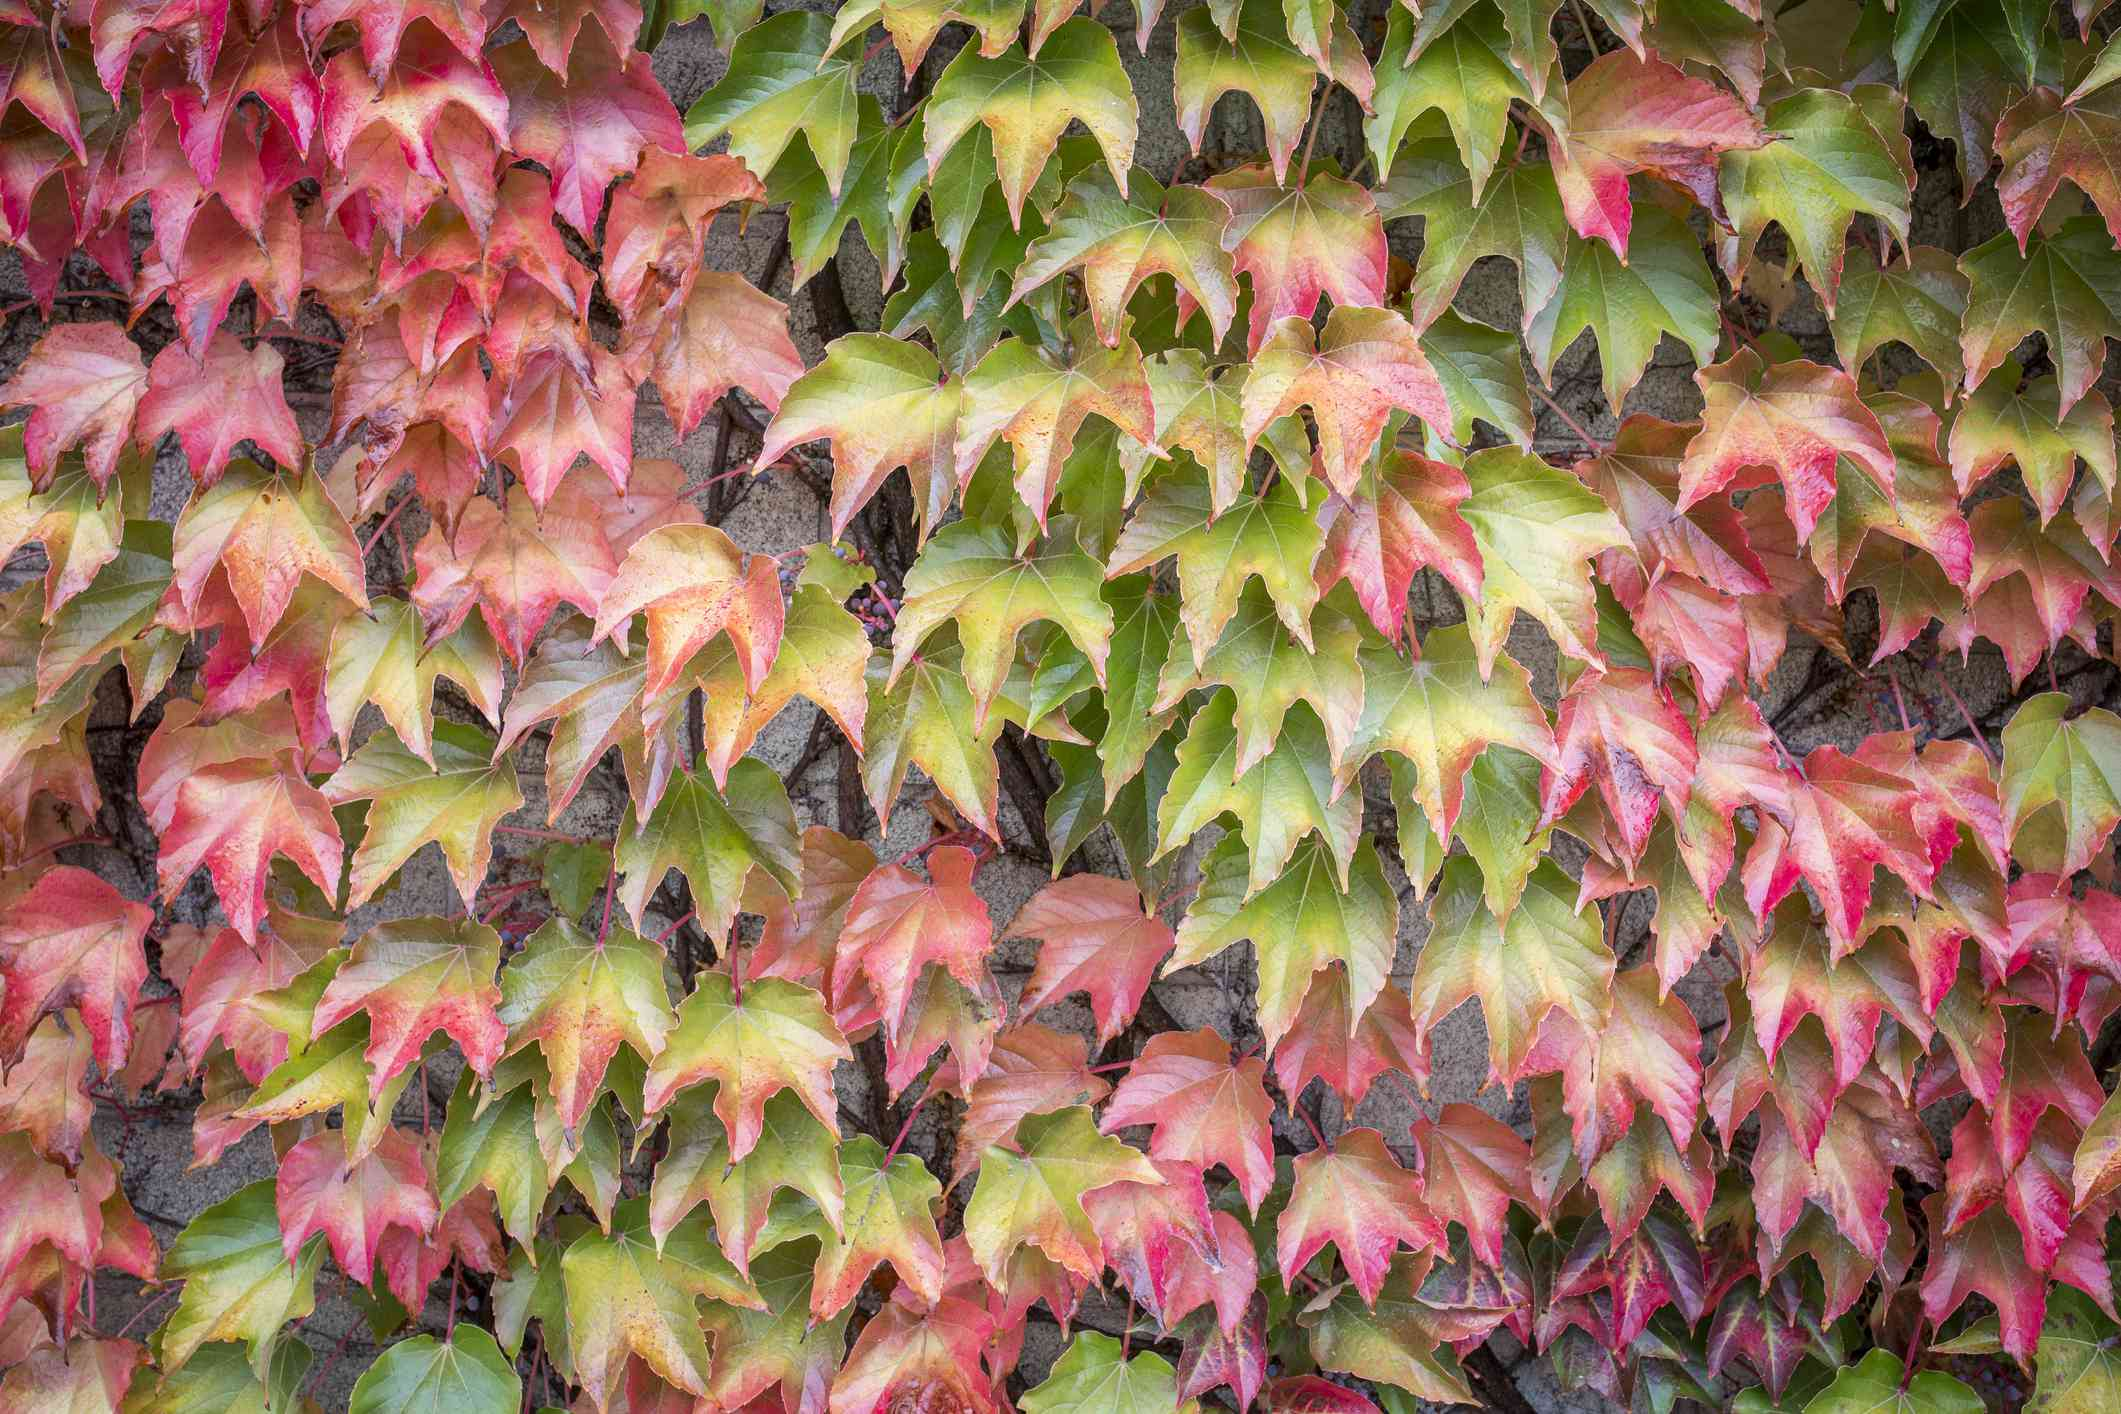 Autumn leaves of Virginia creeper